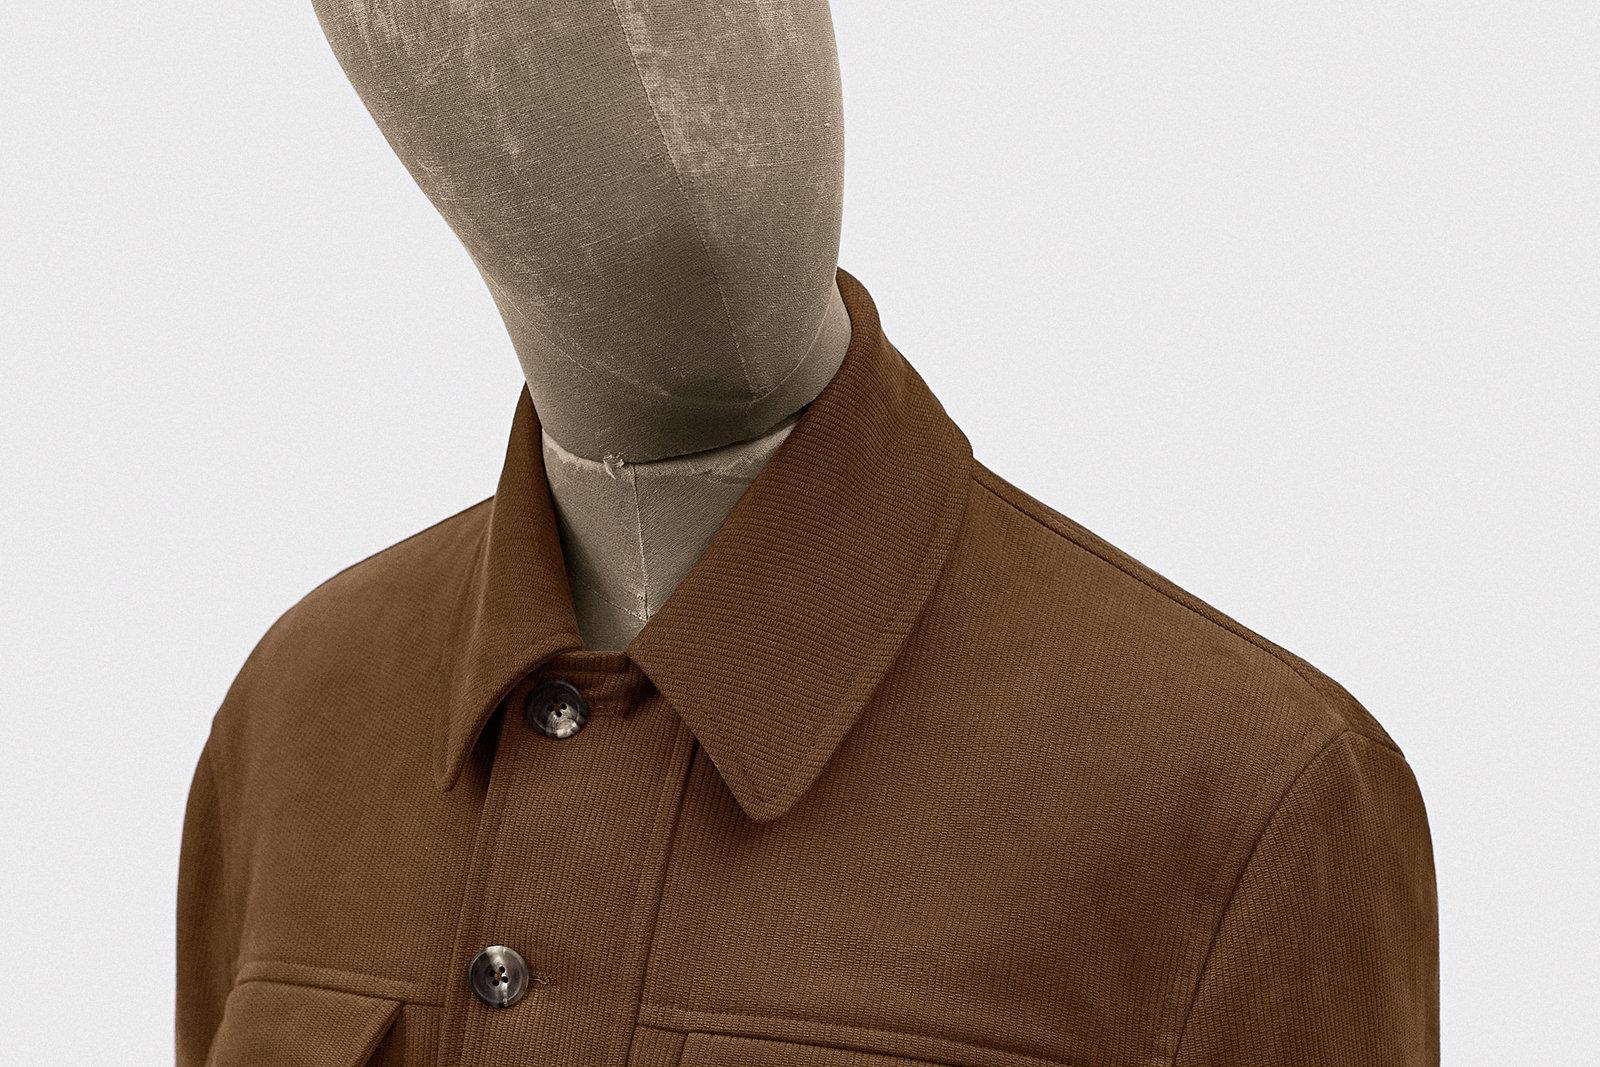 trucker-jacket-bedford-cord-rust-2@2x.jpg